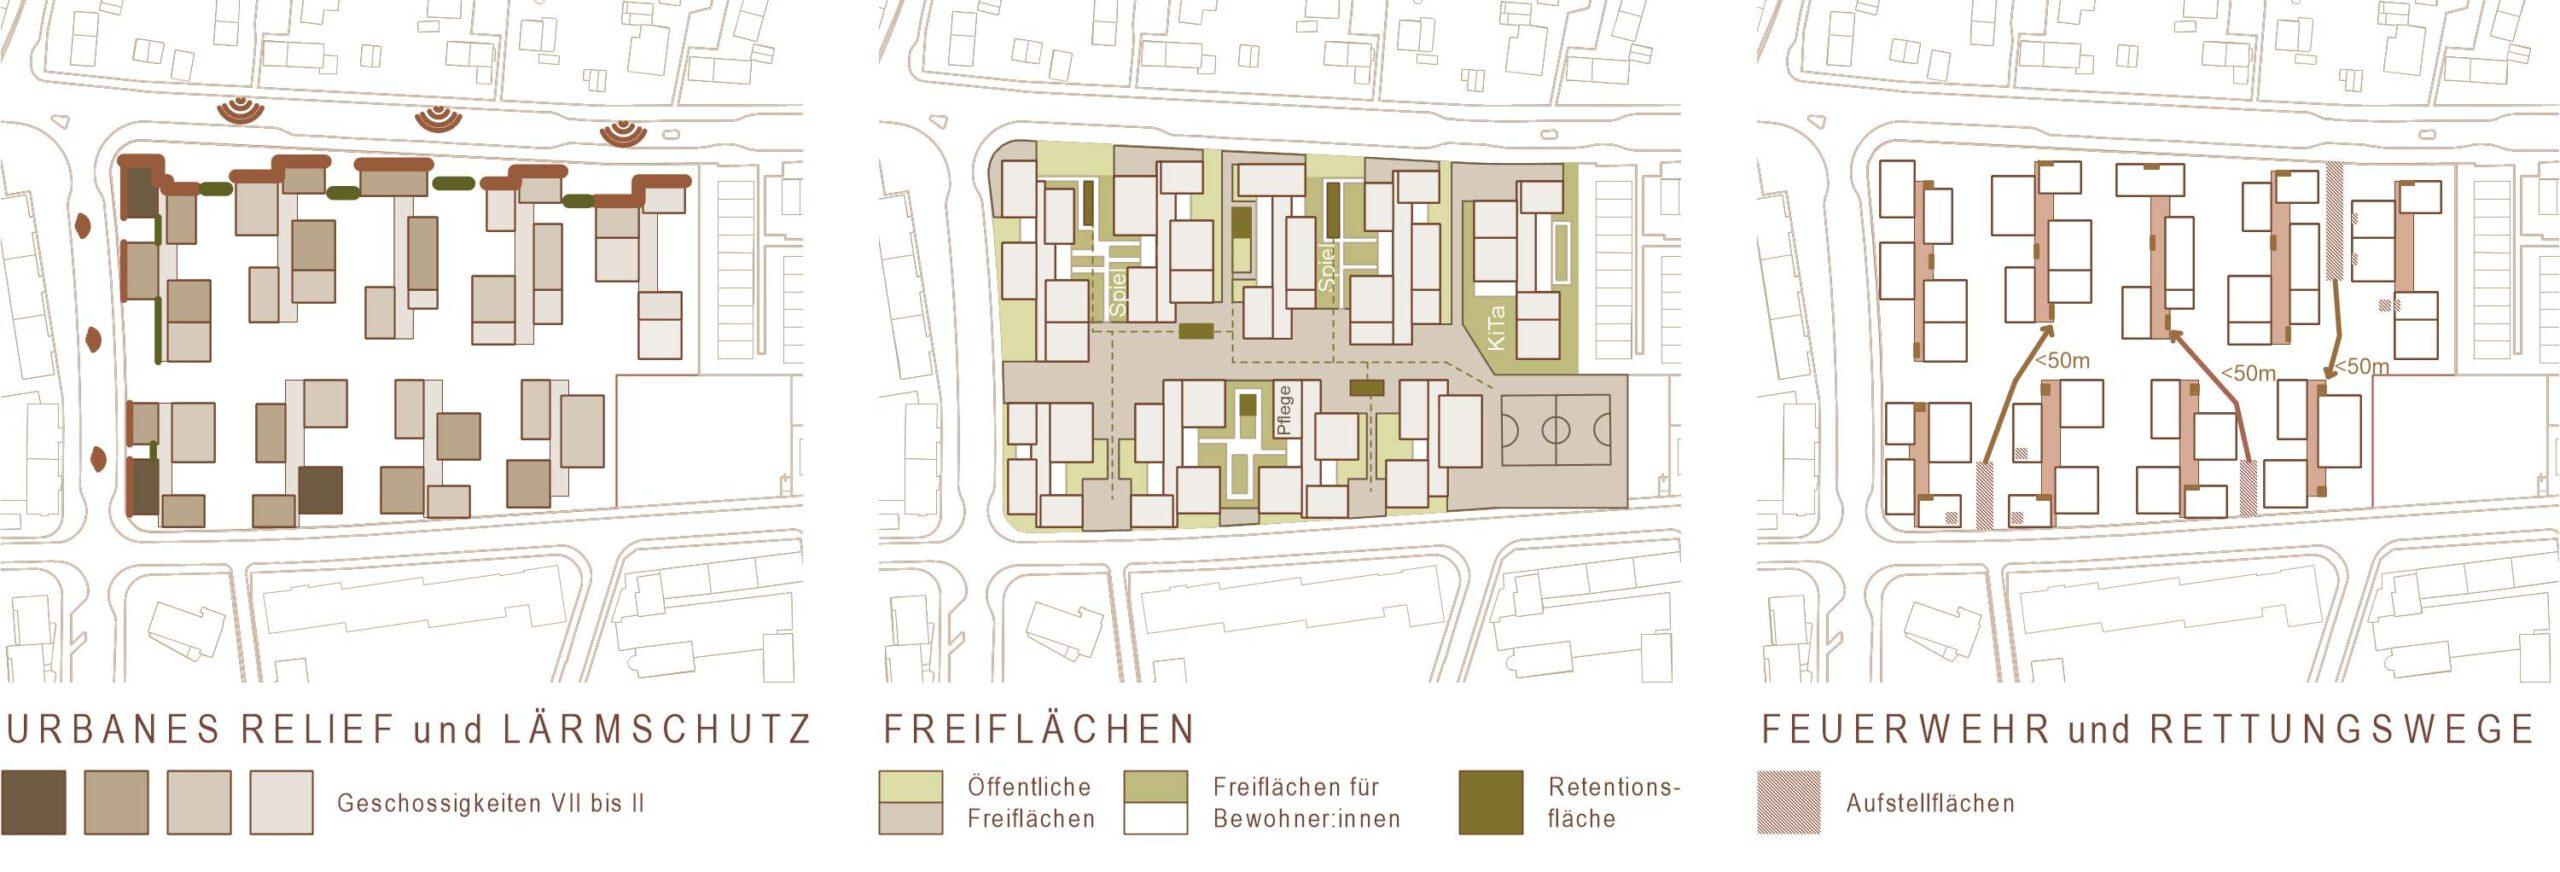 Pikto 371 Quartier am Rotweg Stuttgart Rot FFM-ARCHITEKTEN